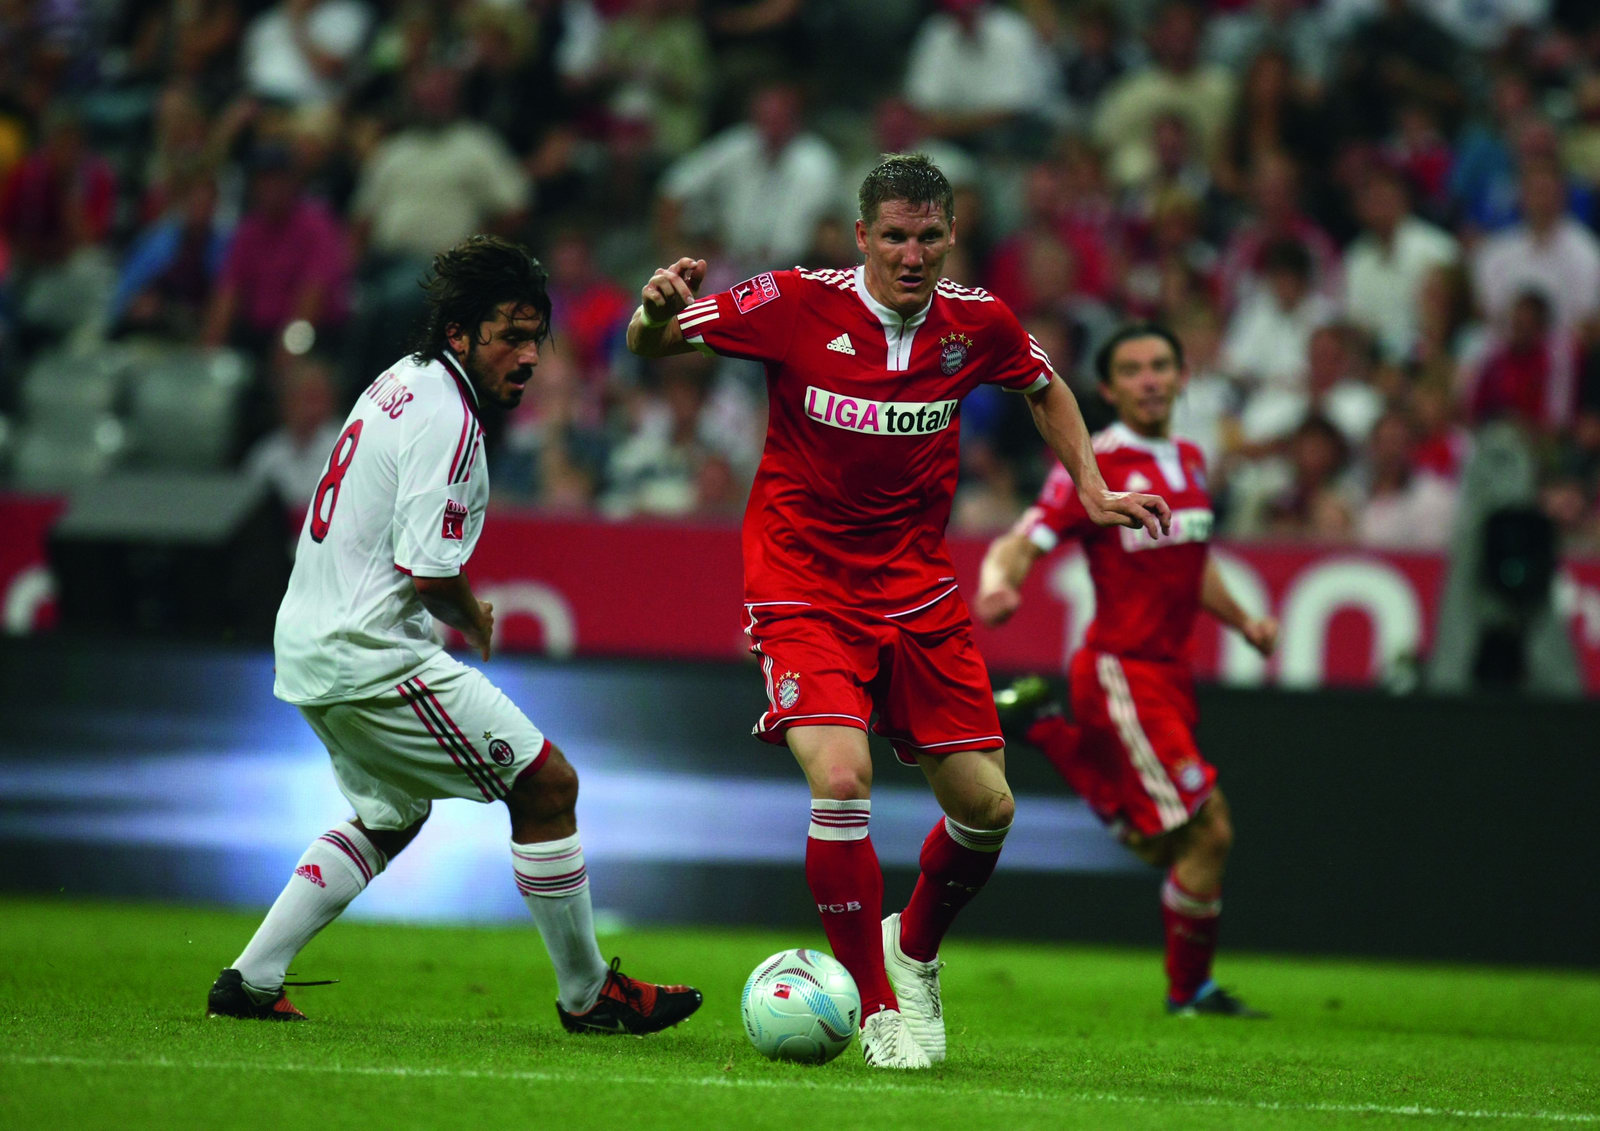 444178_sport_futbol_bavariya_milan_shvajnshtajger_gattuzo_1600x1131_(www.GdeFon.ru)